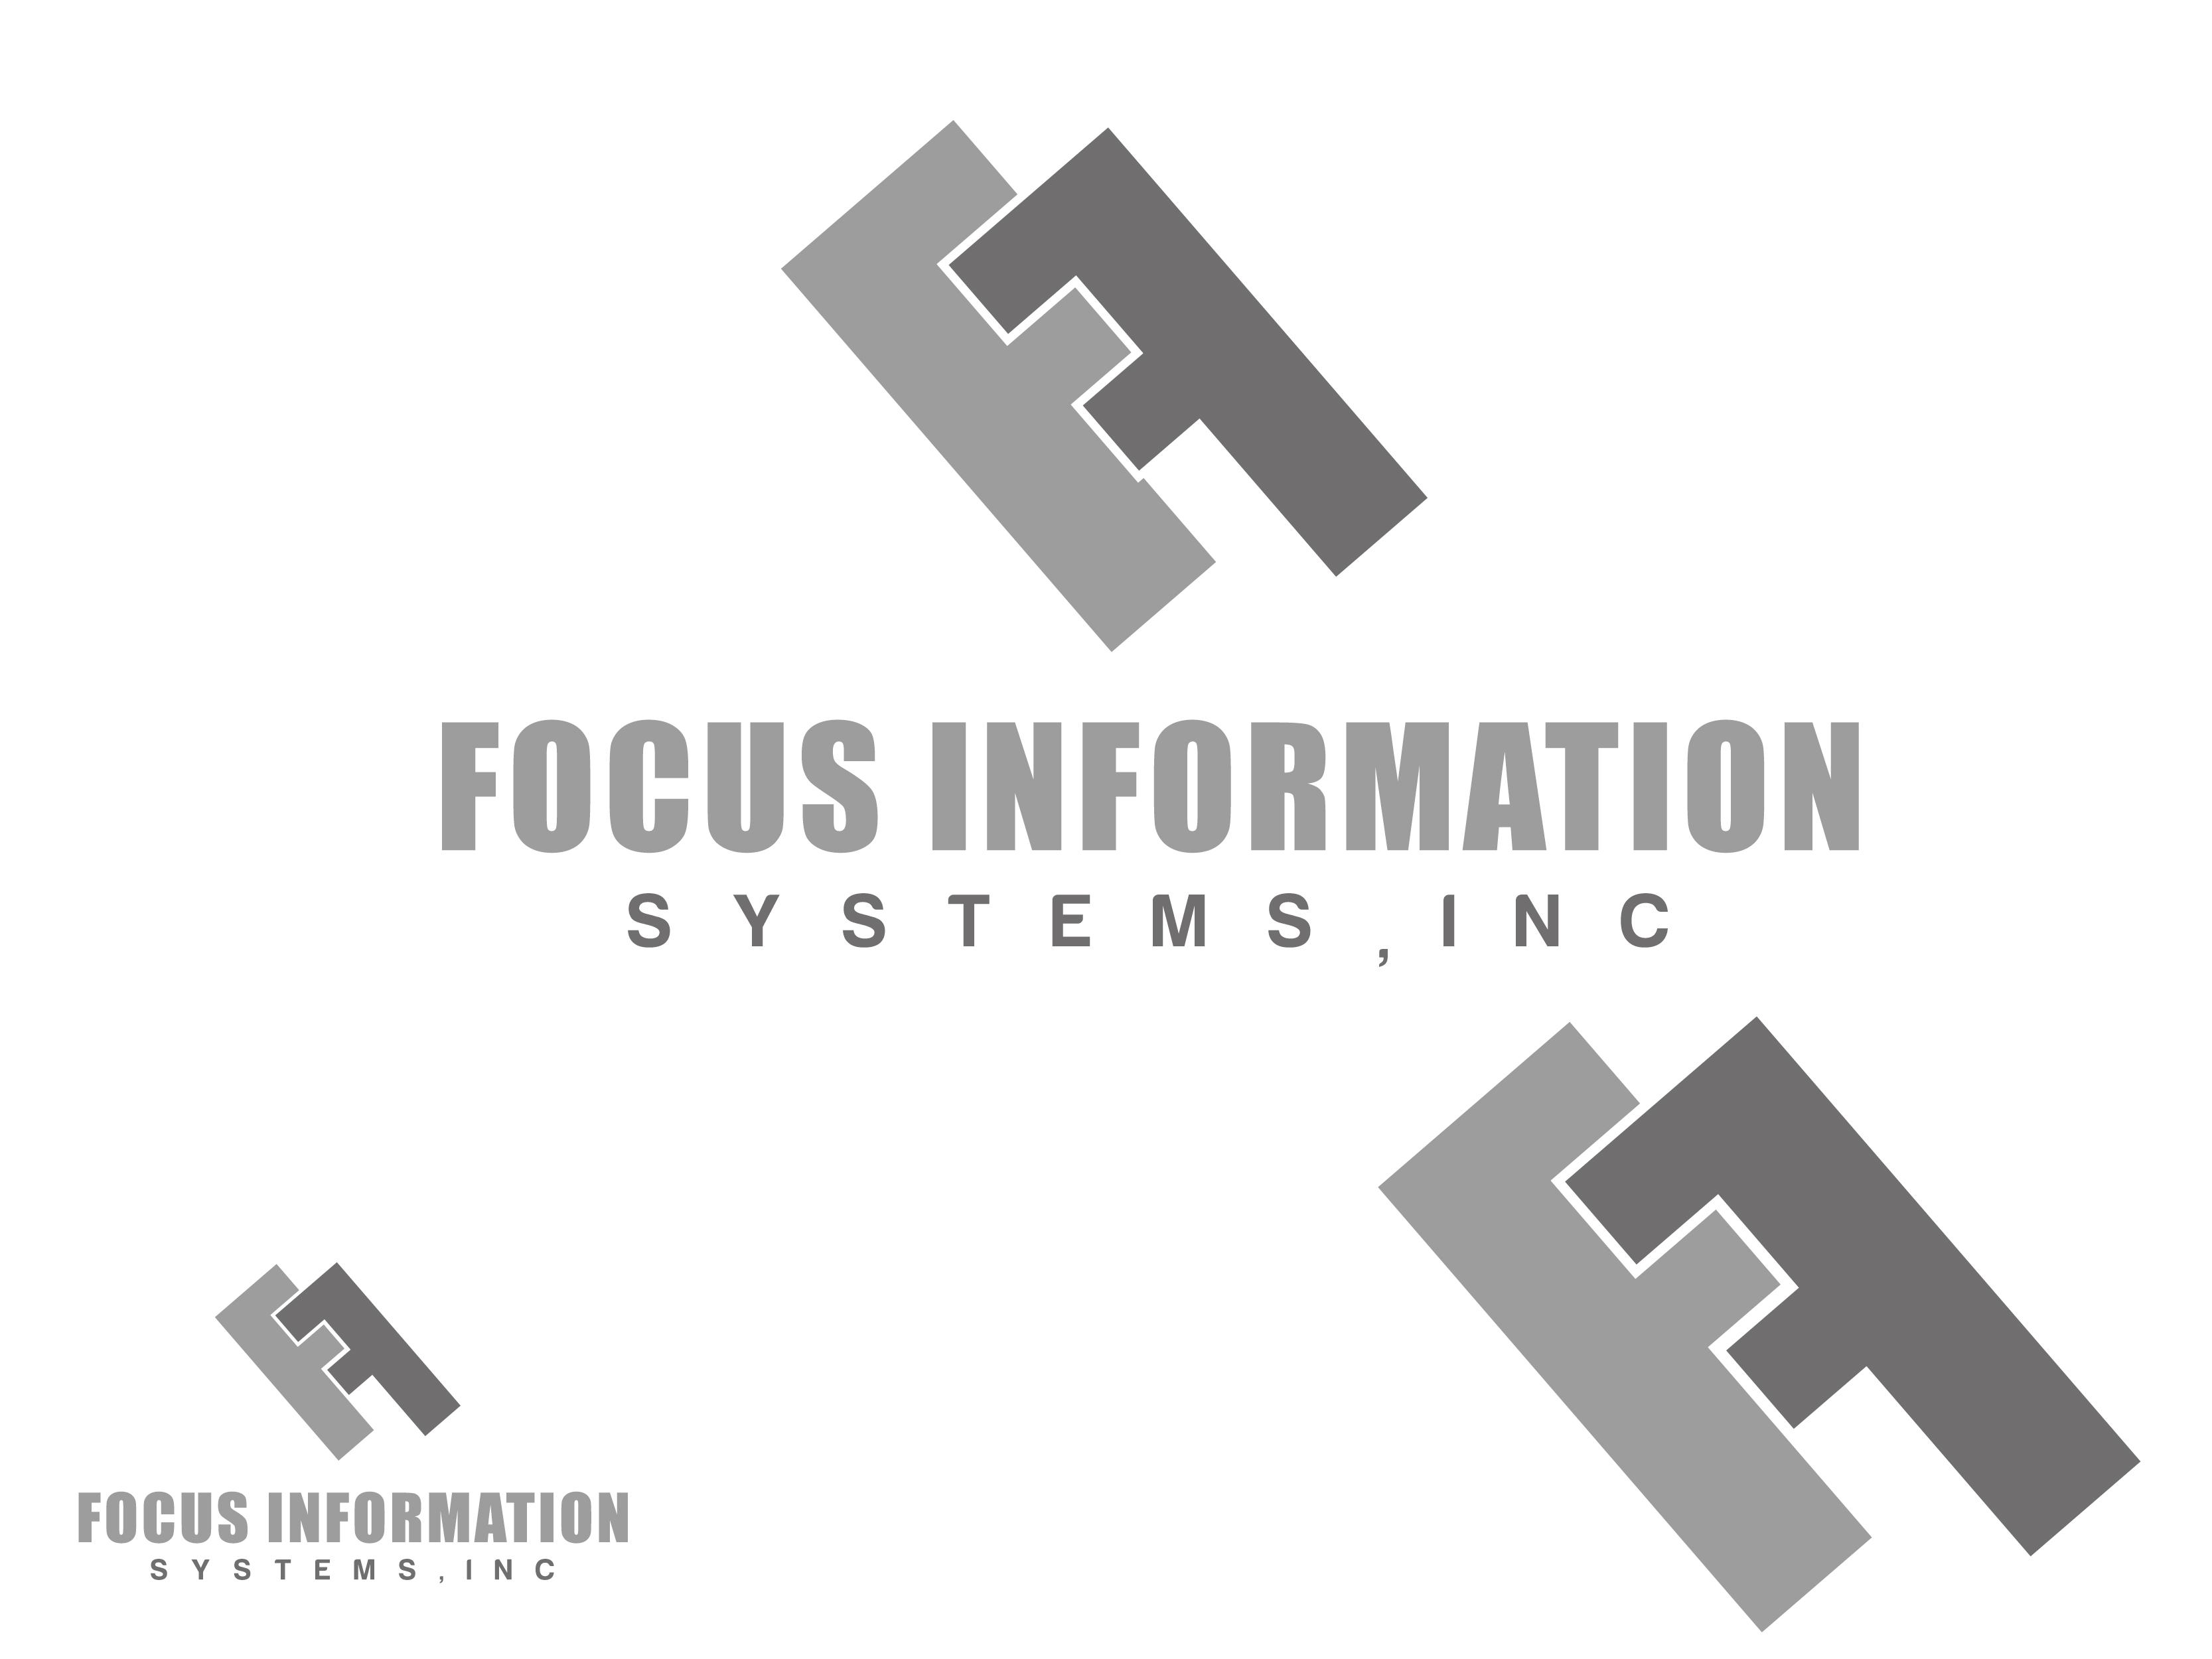 Logo Design by VENTSISLAV KOVACHEV - Entry No. 92 in the Logo Design Contest Artistic Logo Design for Focus Information Systems, Inc..